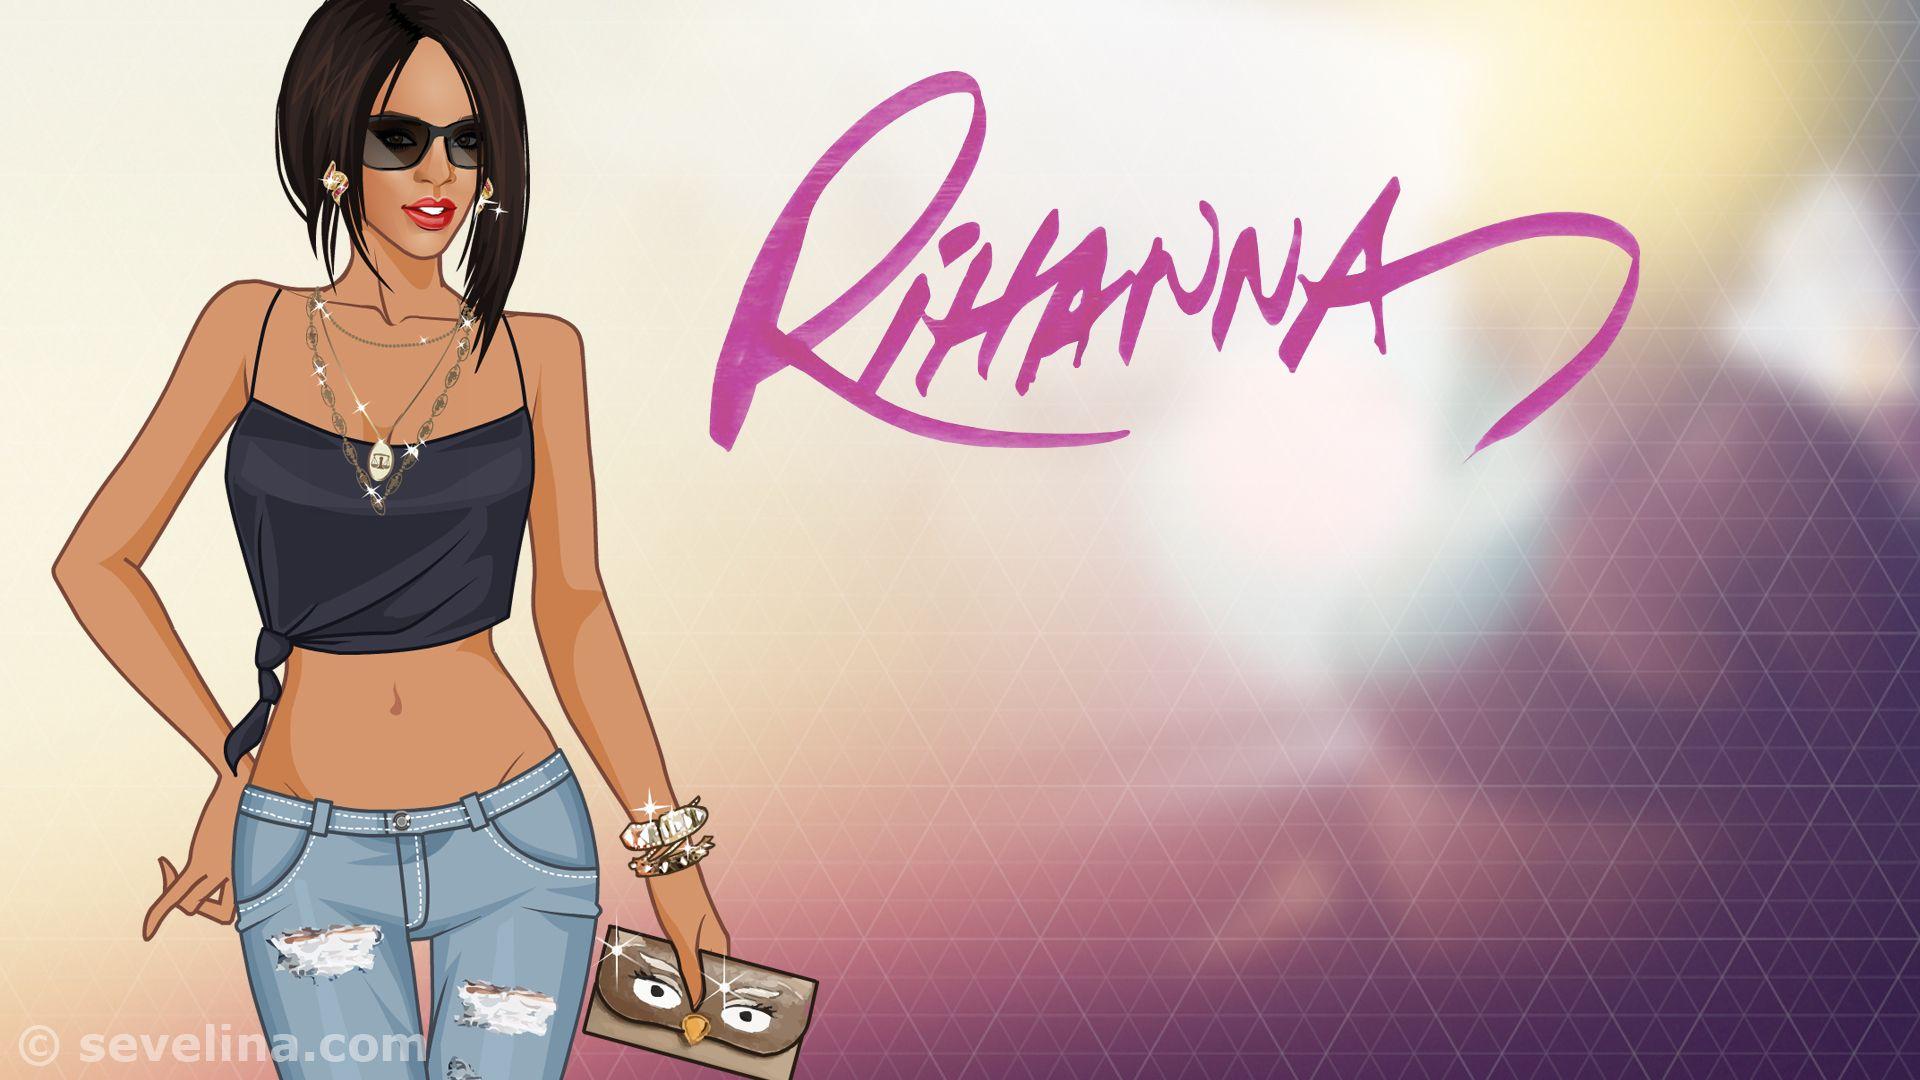 rihanna #wallpapers | rihanna wallpapers | pinterest | rihanna and